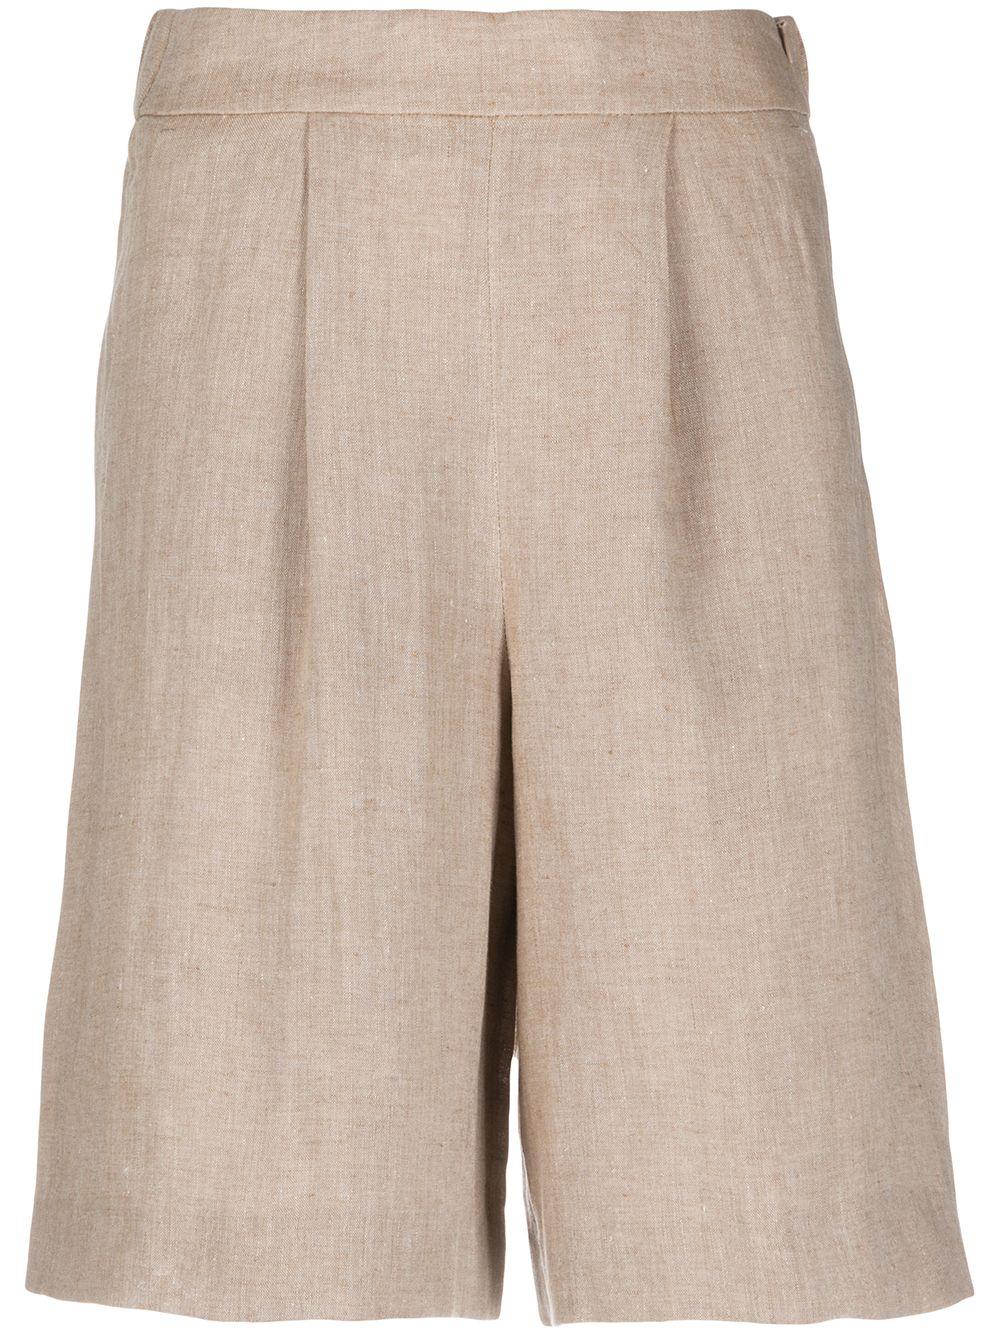 Peserico Shorts mit lockerem Schnitt - Nude